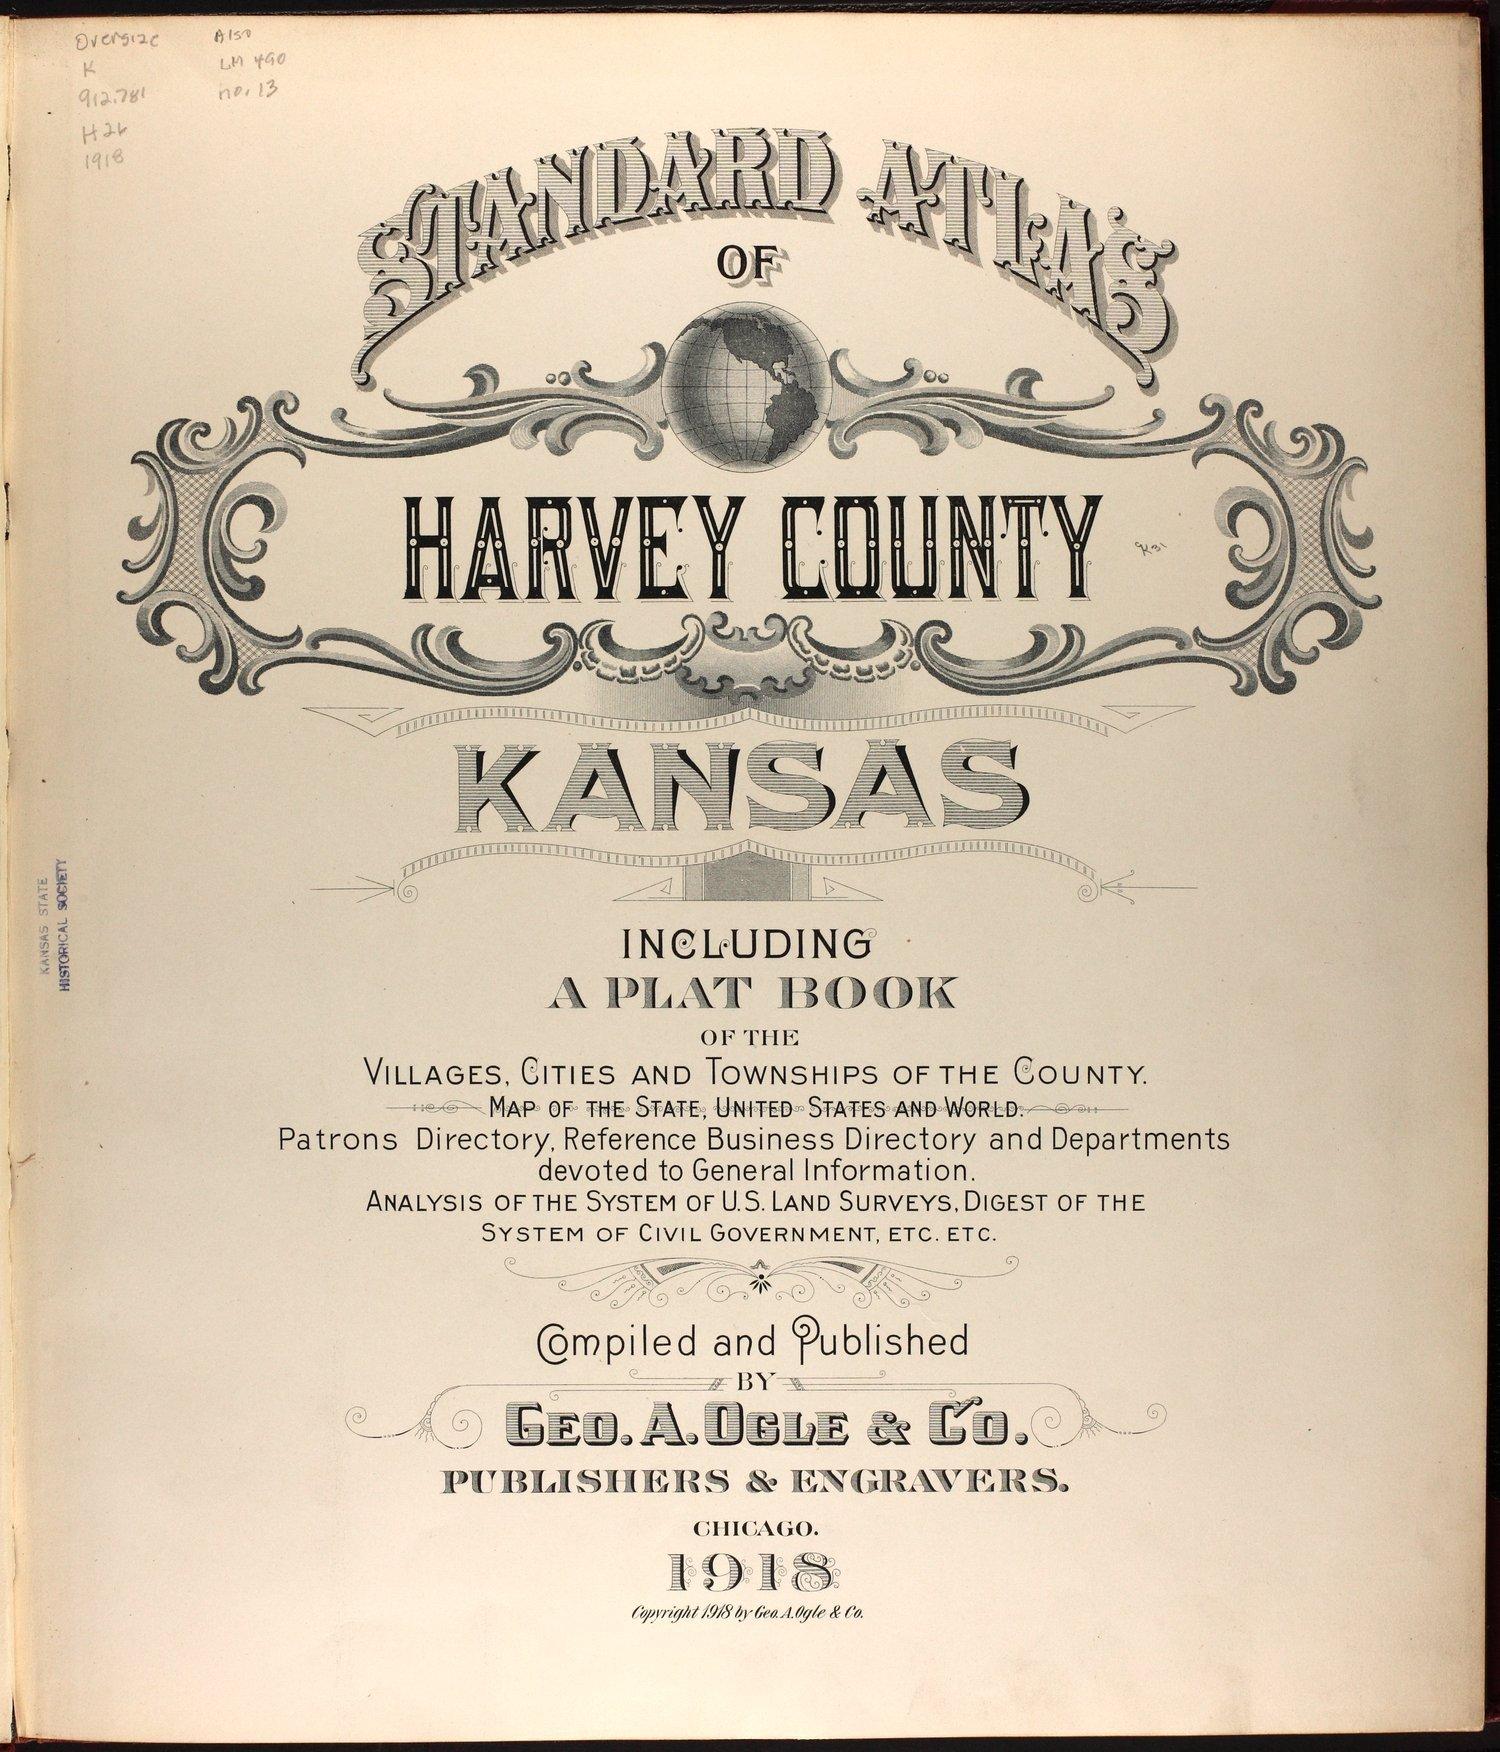 Standard atlas of Harvey County, Kansas - Title Page